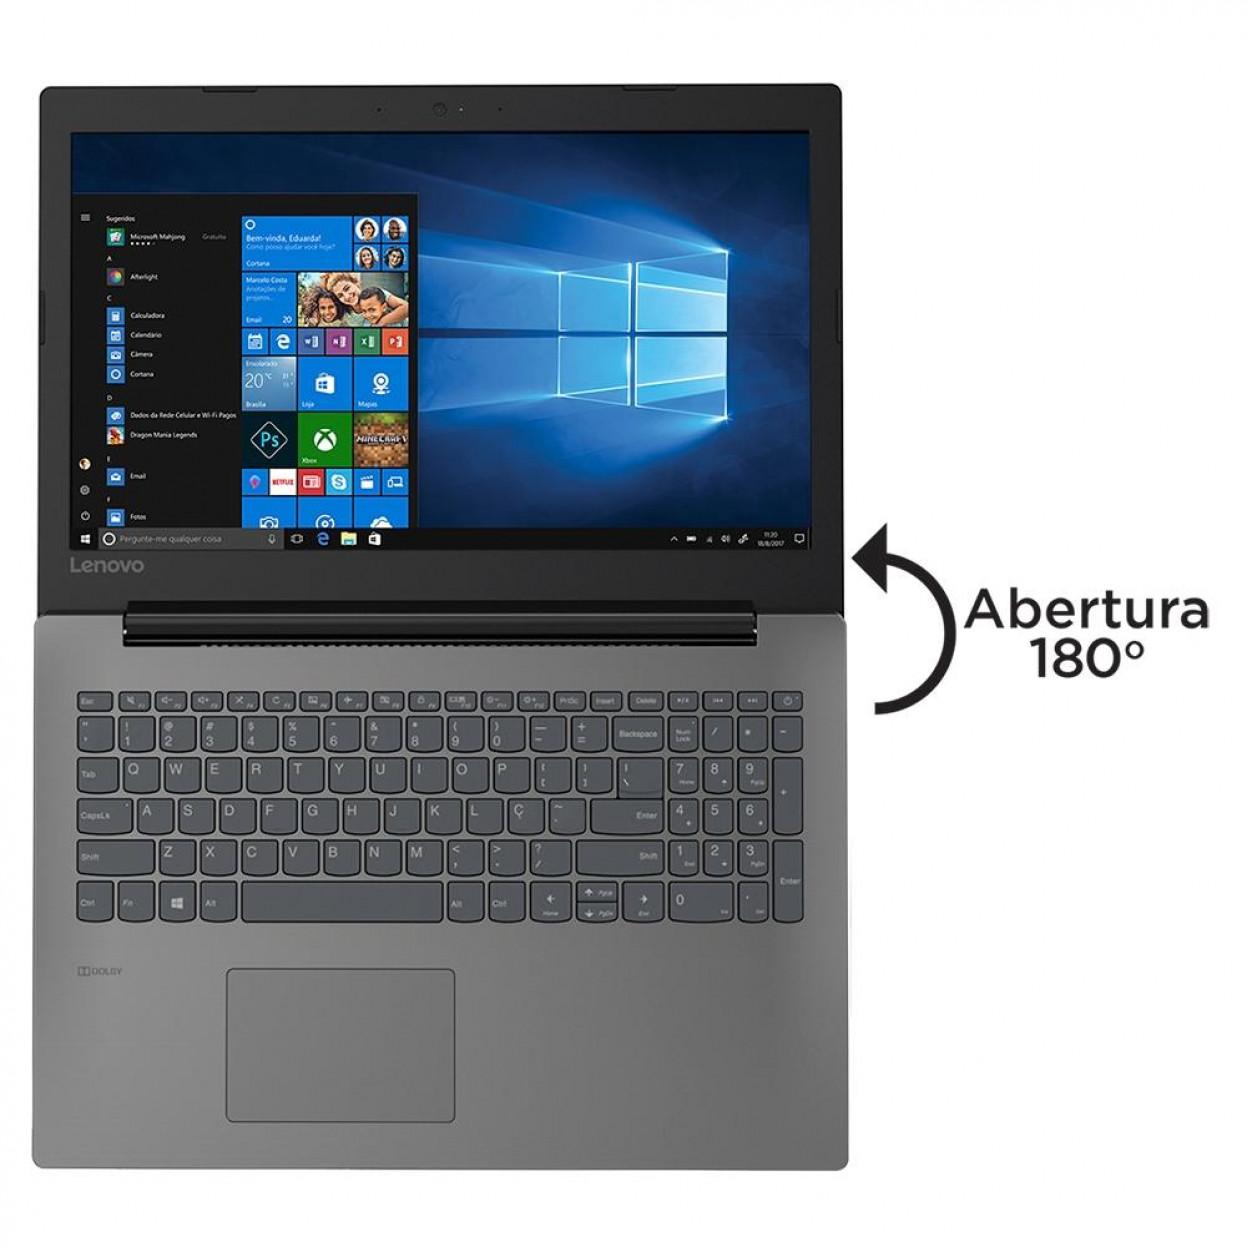 Notebook Lenovo B330 Core I5 8250u Memoria 8gb Ddr4 Hd 1tb Tela 15.6' Fhd Windows 10 Home